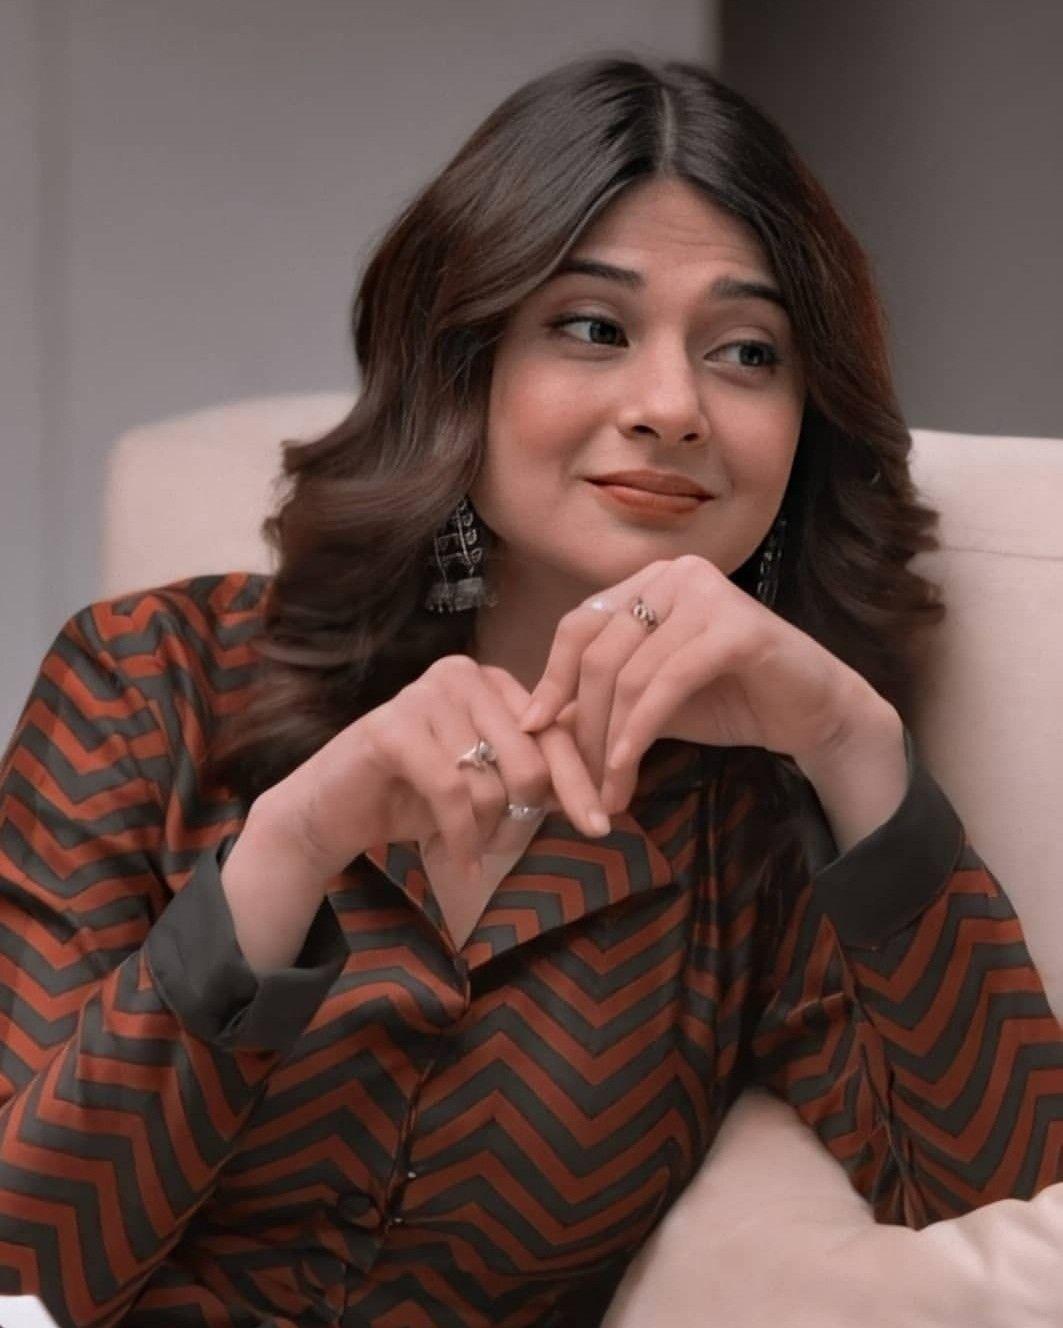 Pin by Iman Shariff🌹 on Indian in 2020 | Jennifer winget ...